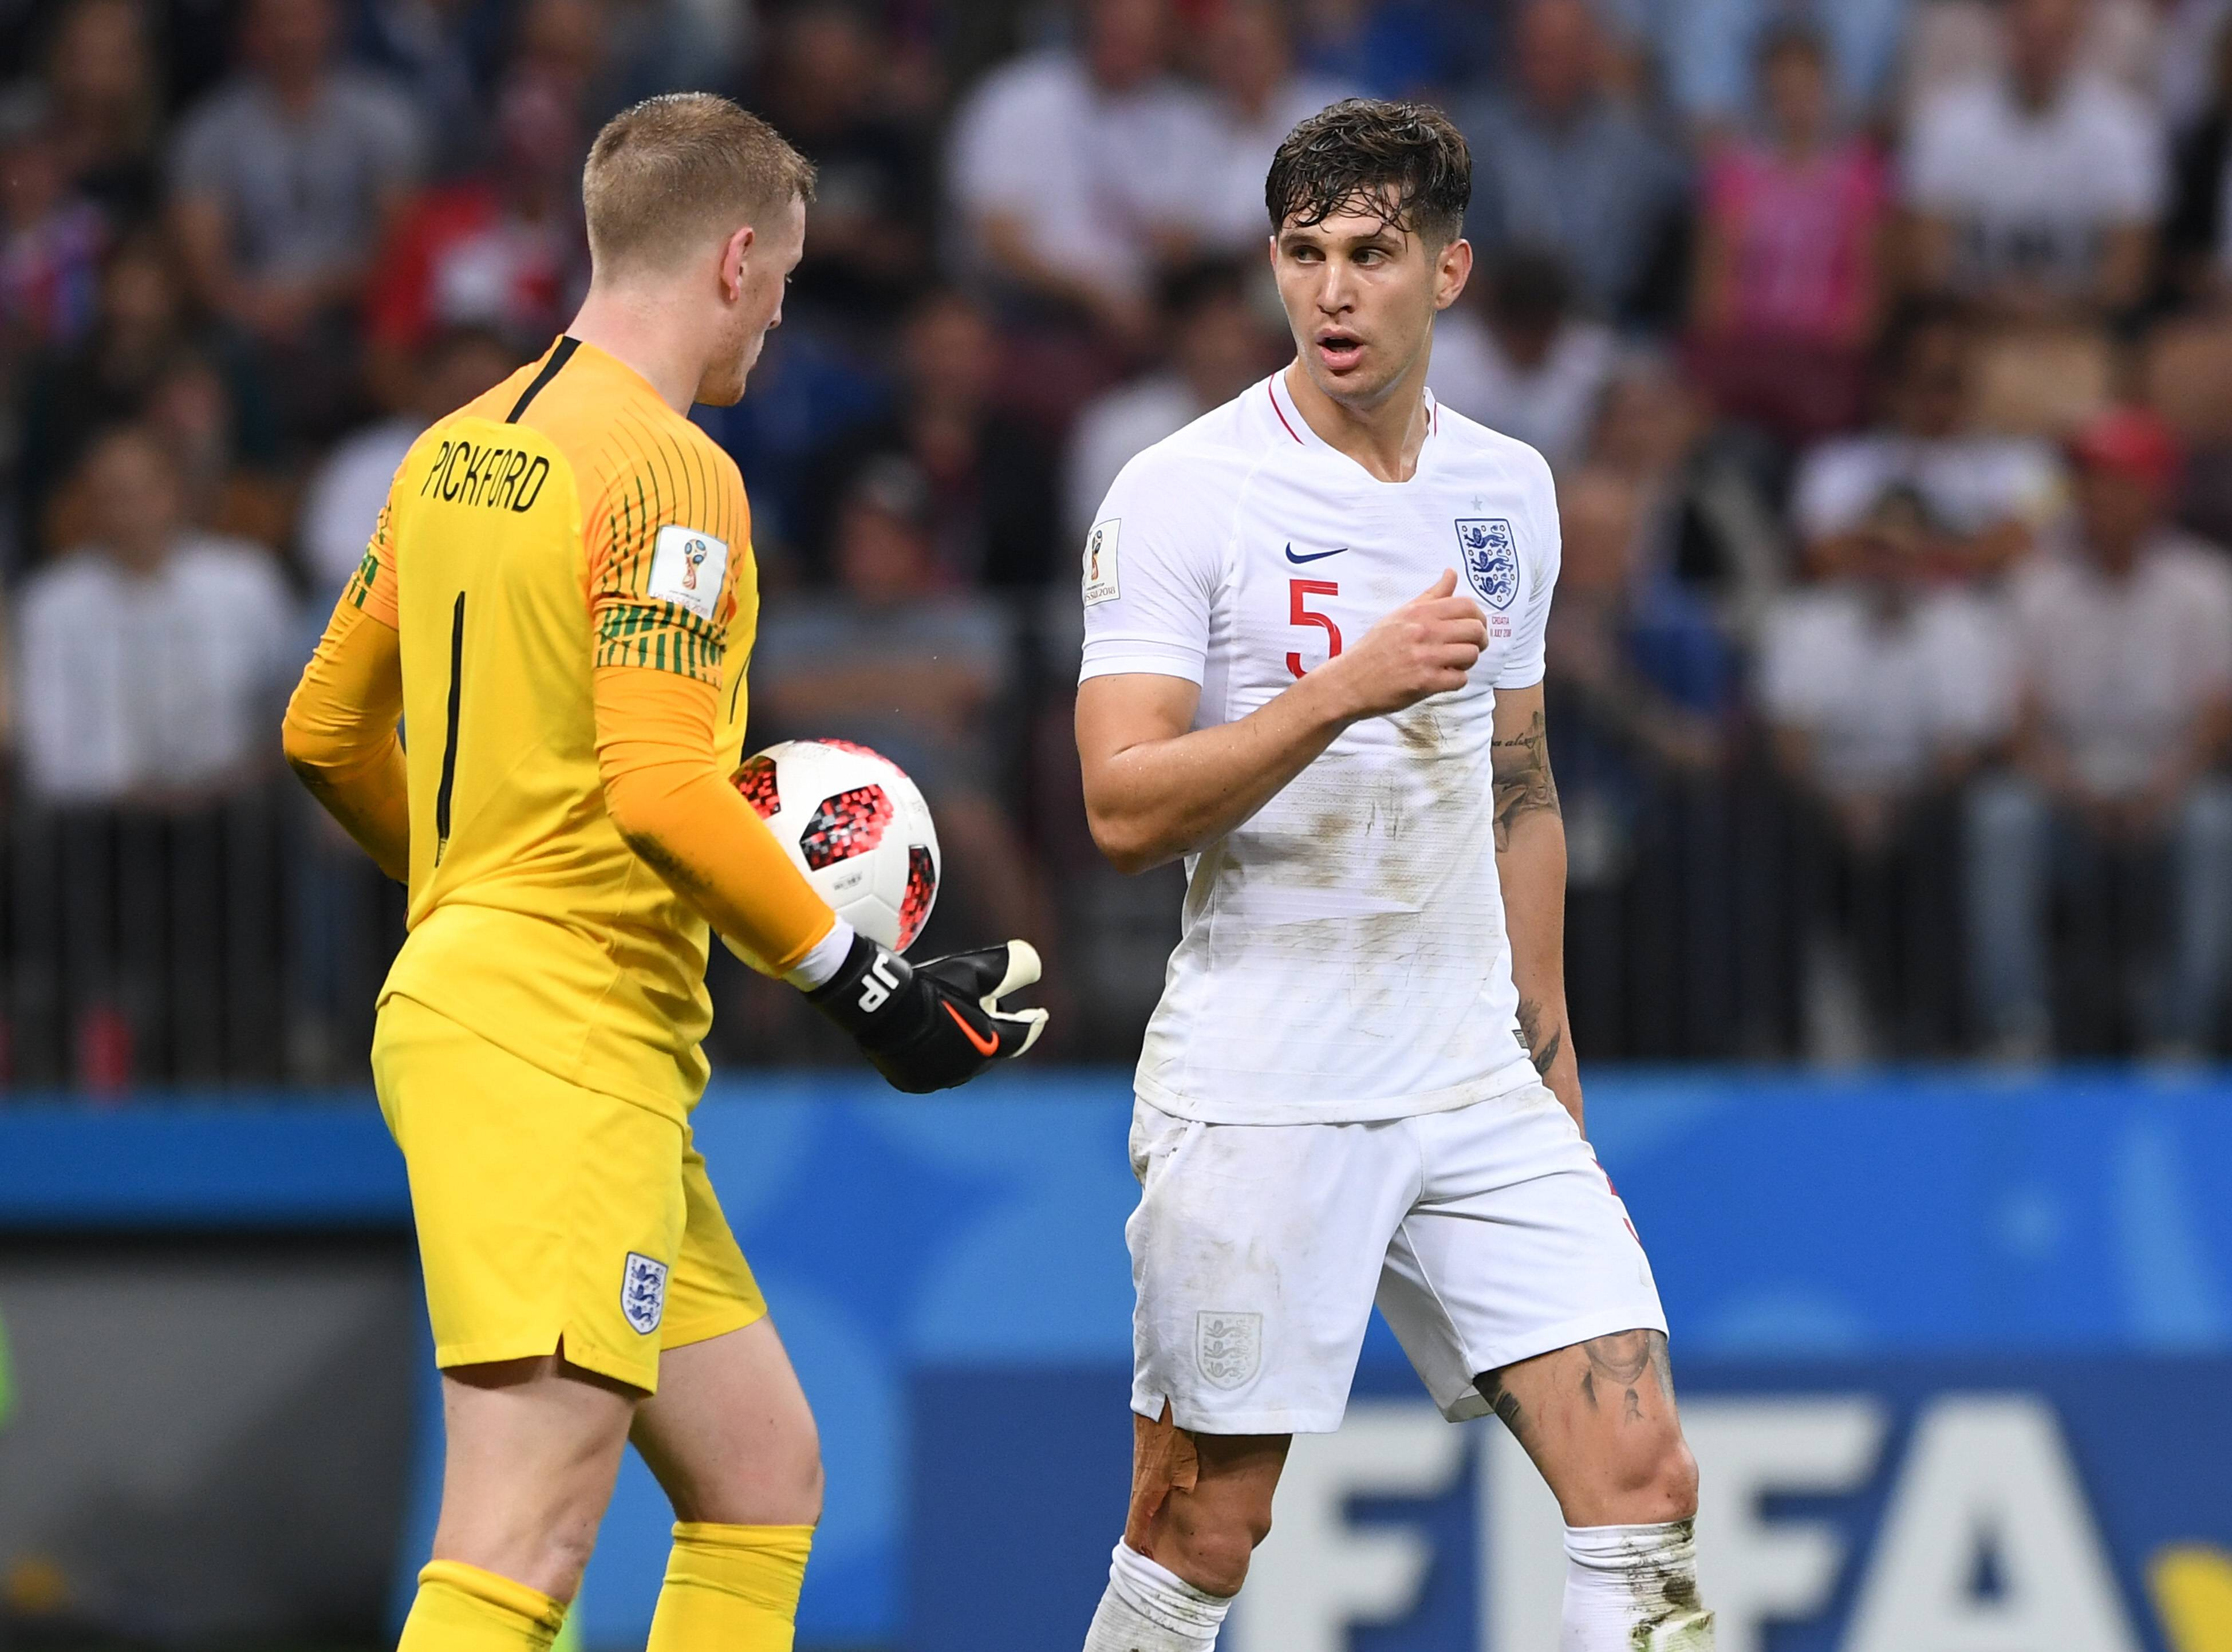 Gareth Southgate reacts to heated debate between Everton's Jordan Pickford and Manchester City's John Stones   Sportslens.com